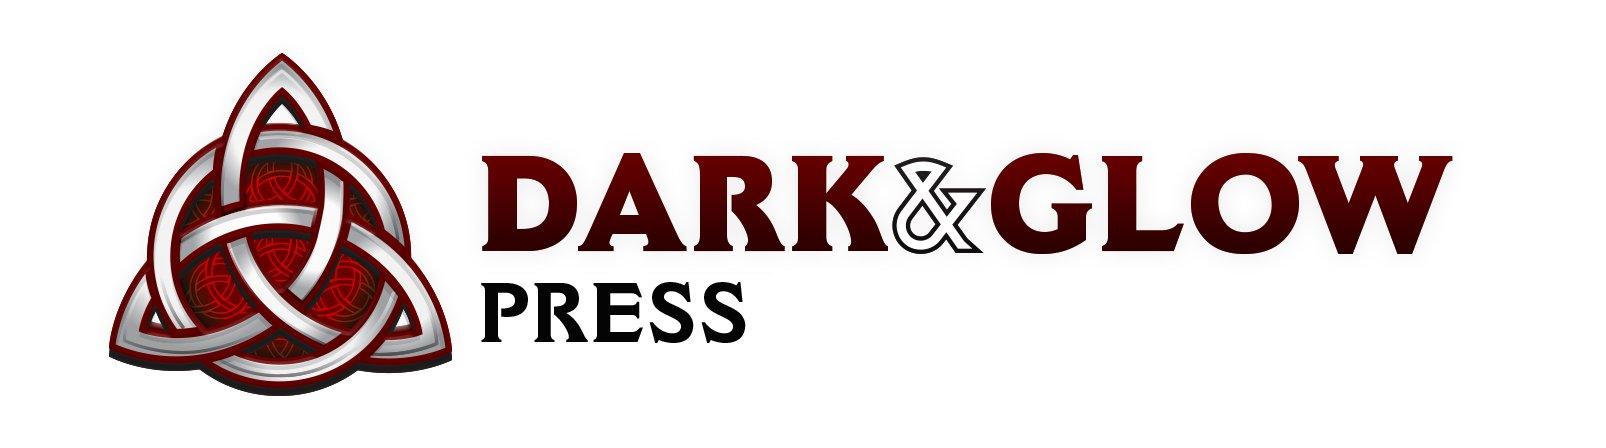 dark and glow press